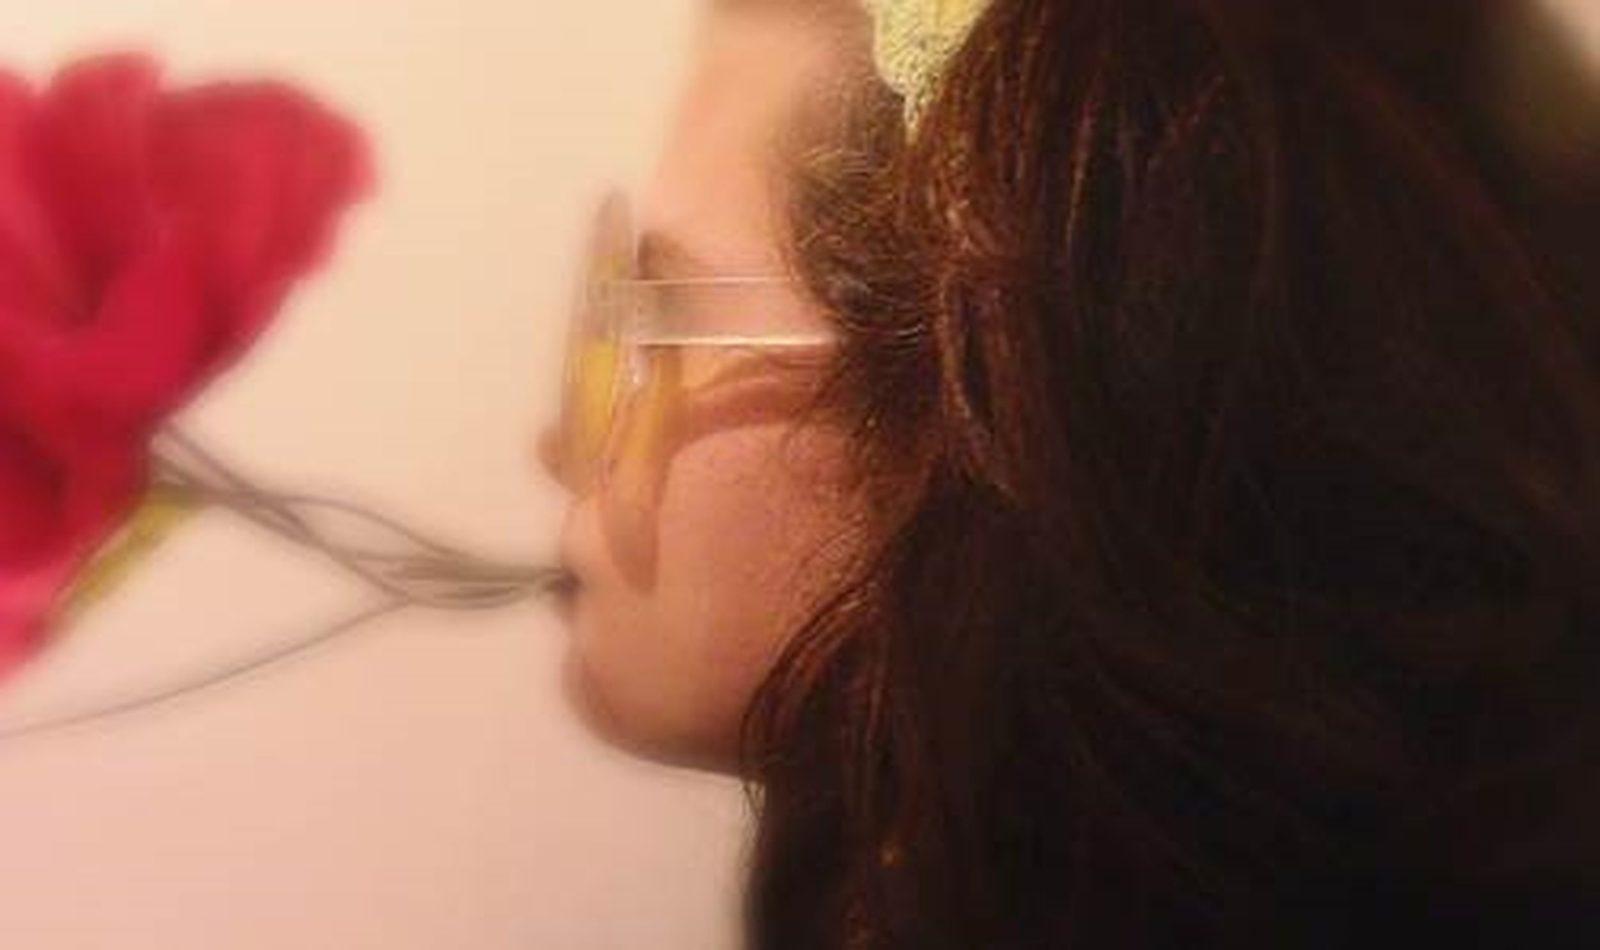 FRANCKHAUSER Chloé - Imperfection 8